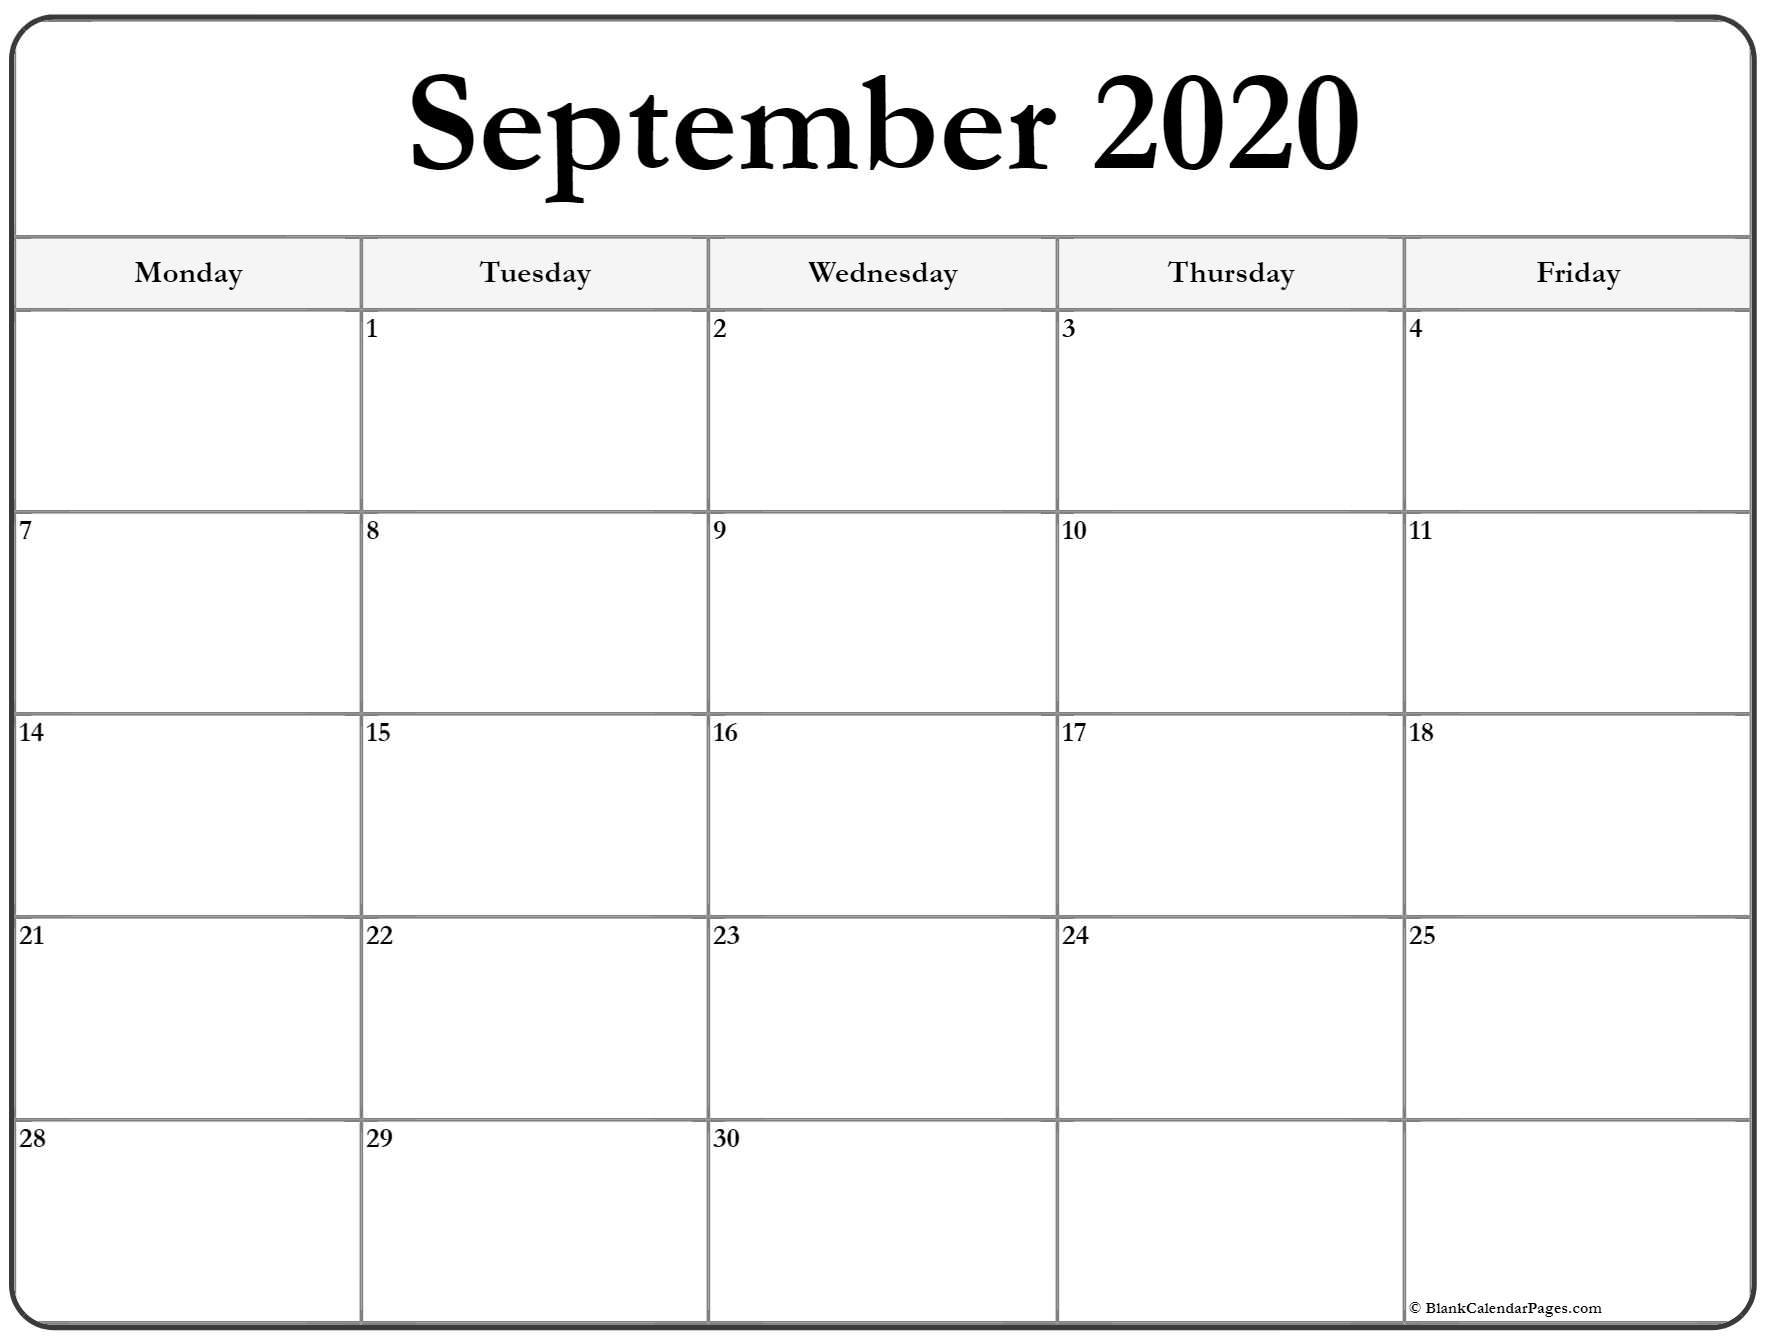 September 2020 Monday Calendar | Monday To Sunday regarding Weekly Calendar Monday Through Friday